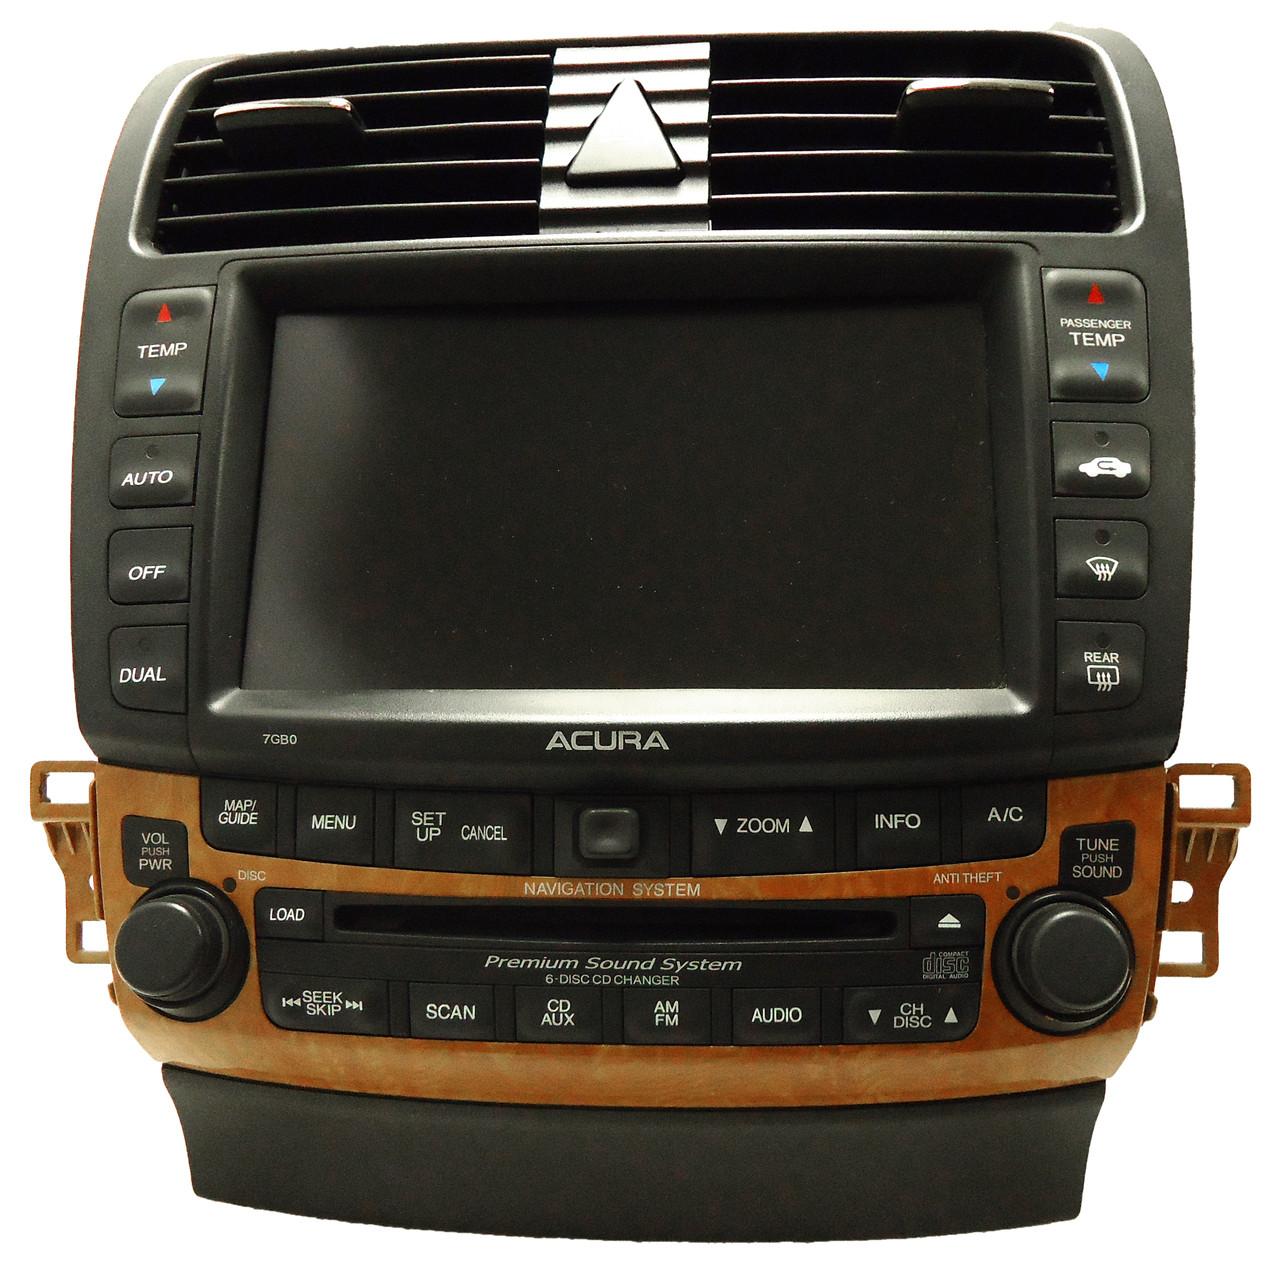 ACURA TSX Navigation GPS System Radio 6 Disc Changer CD